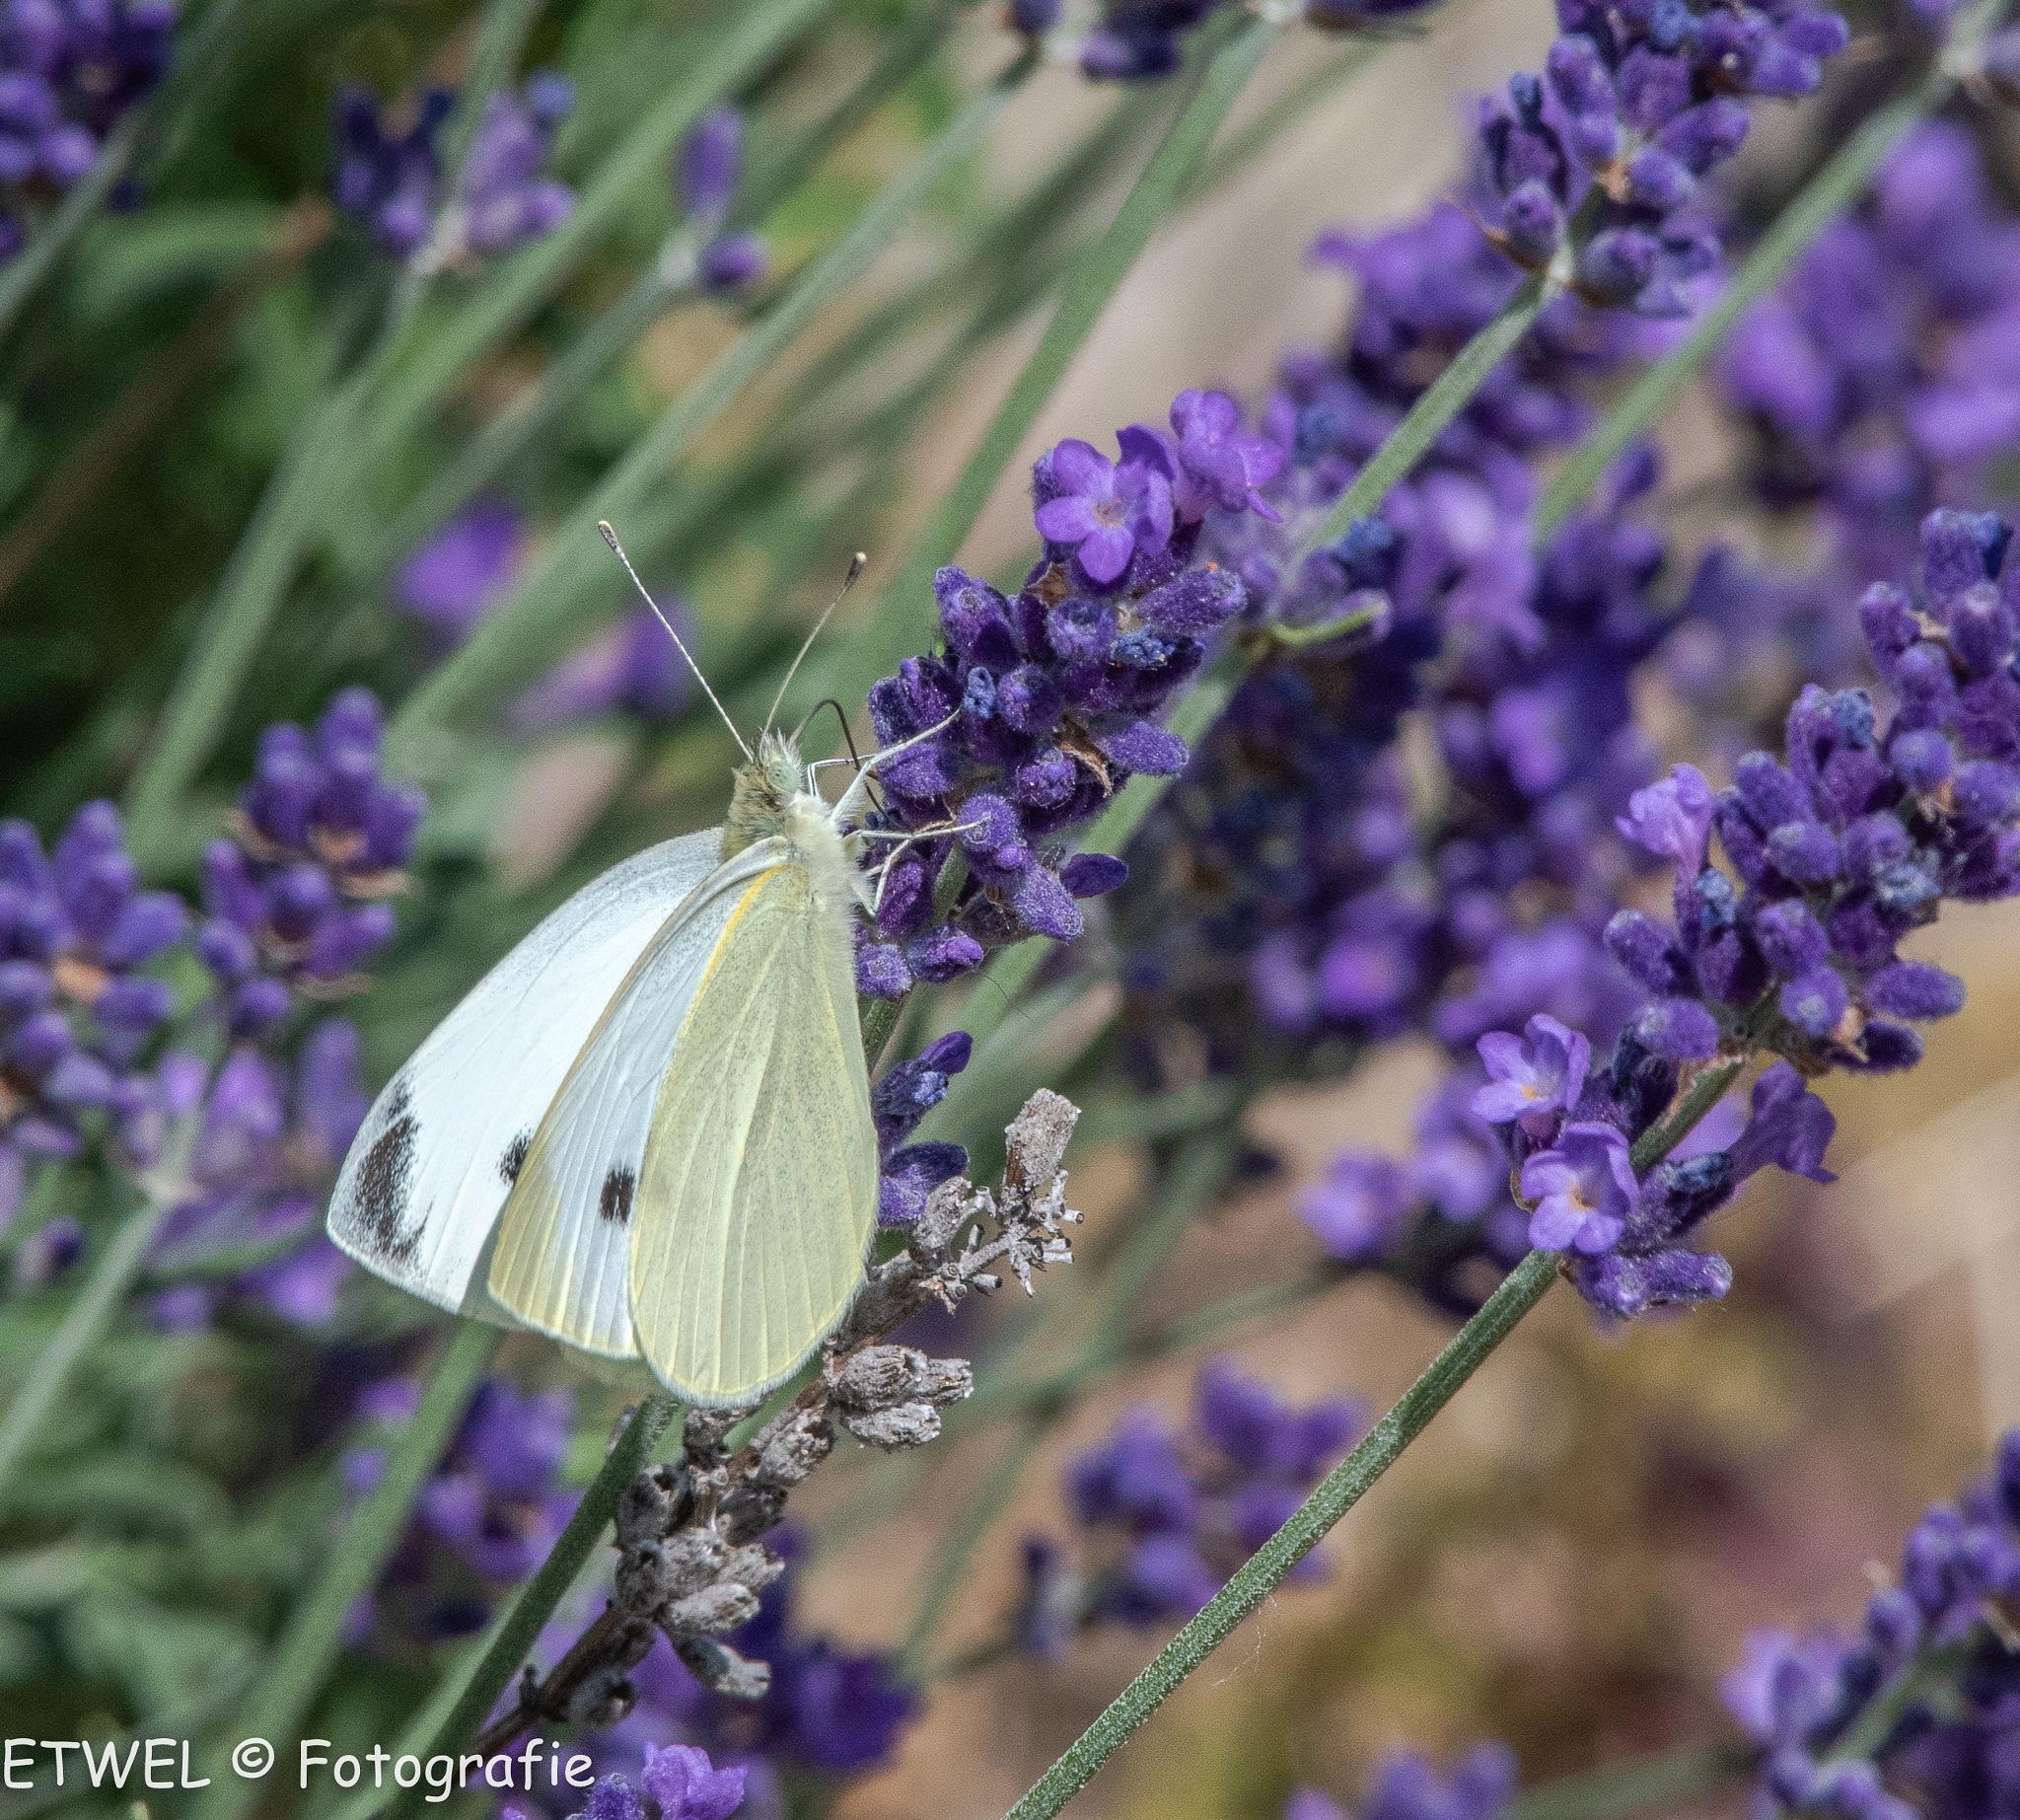 Cabbage white on lavender by        ETWEL © Fotografie